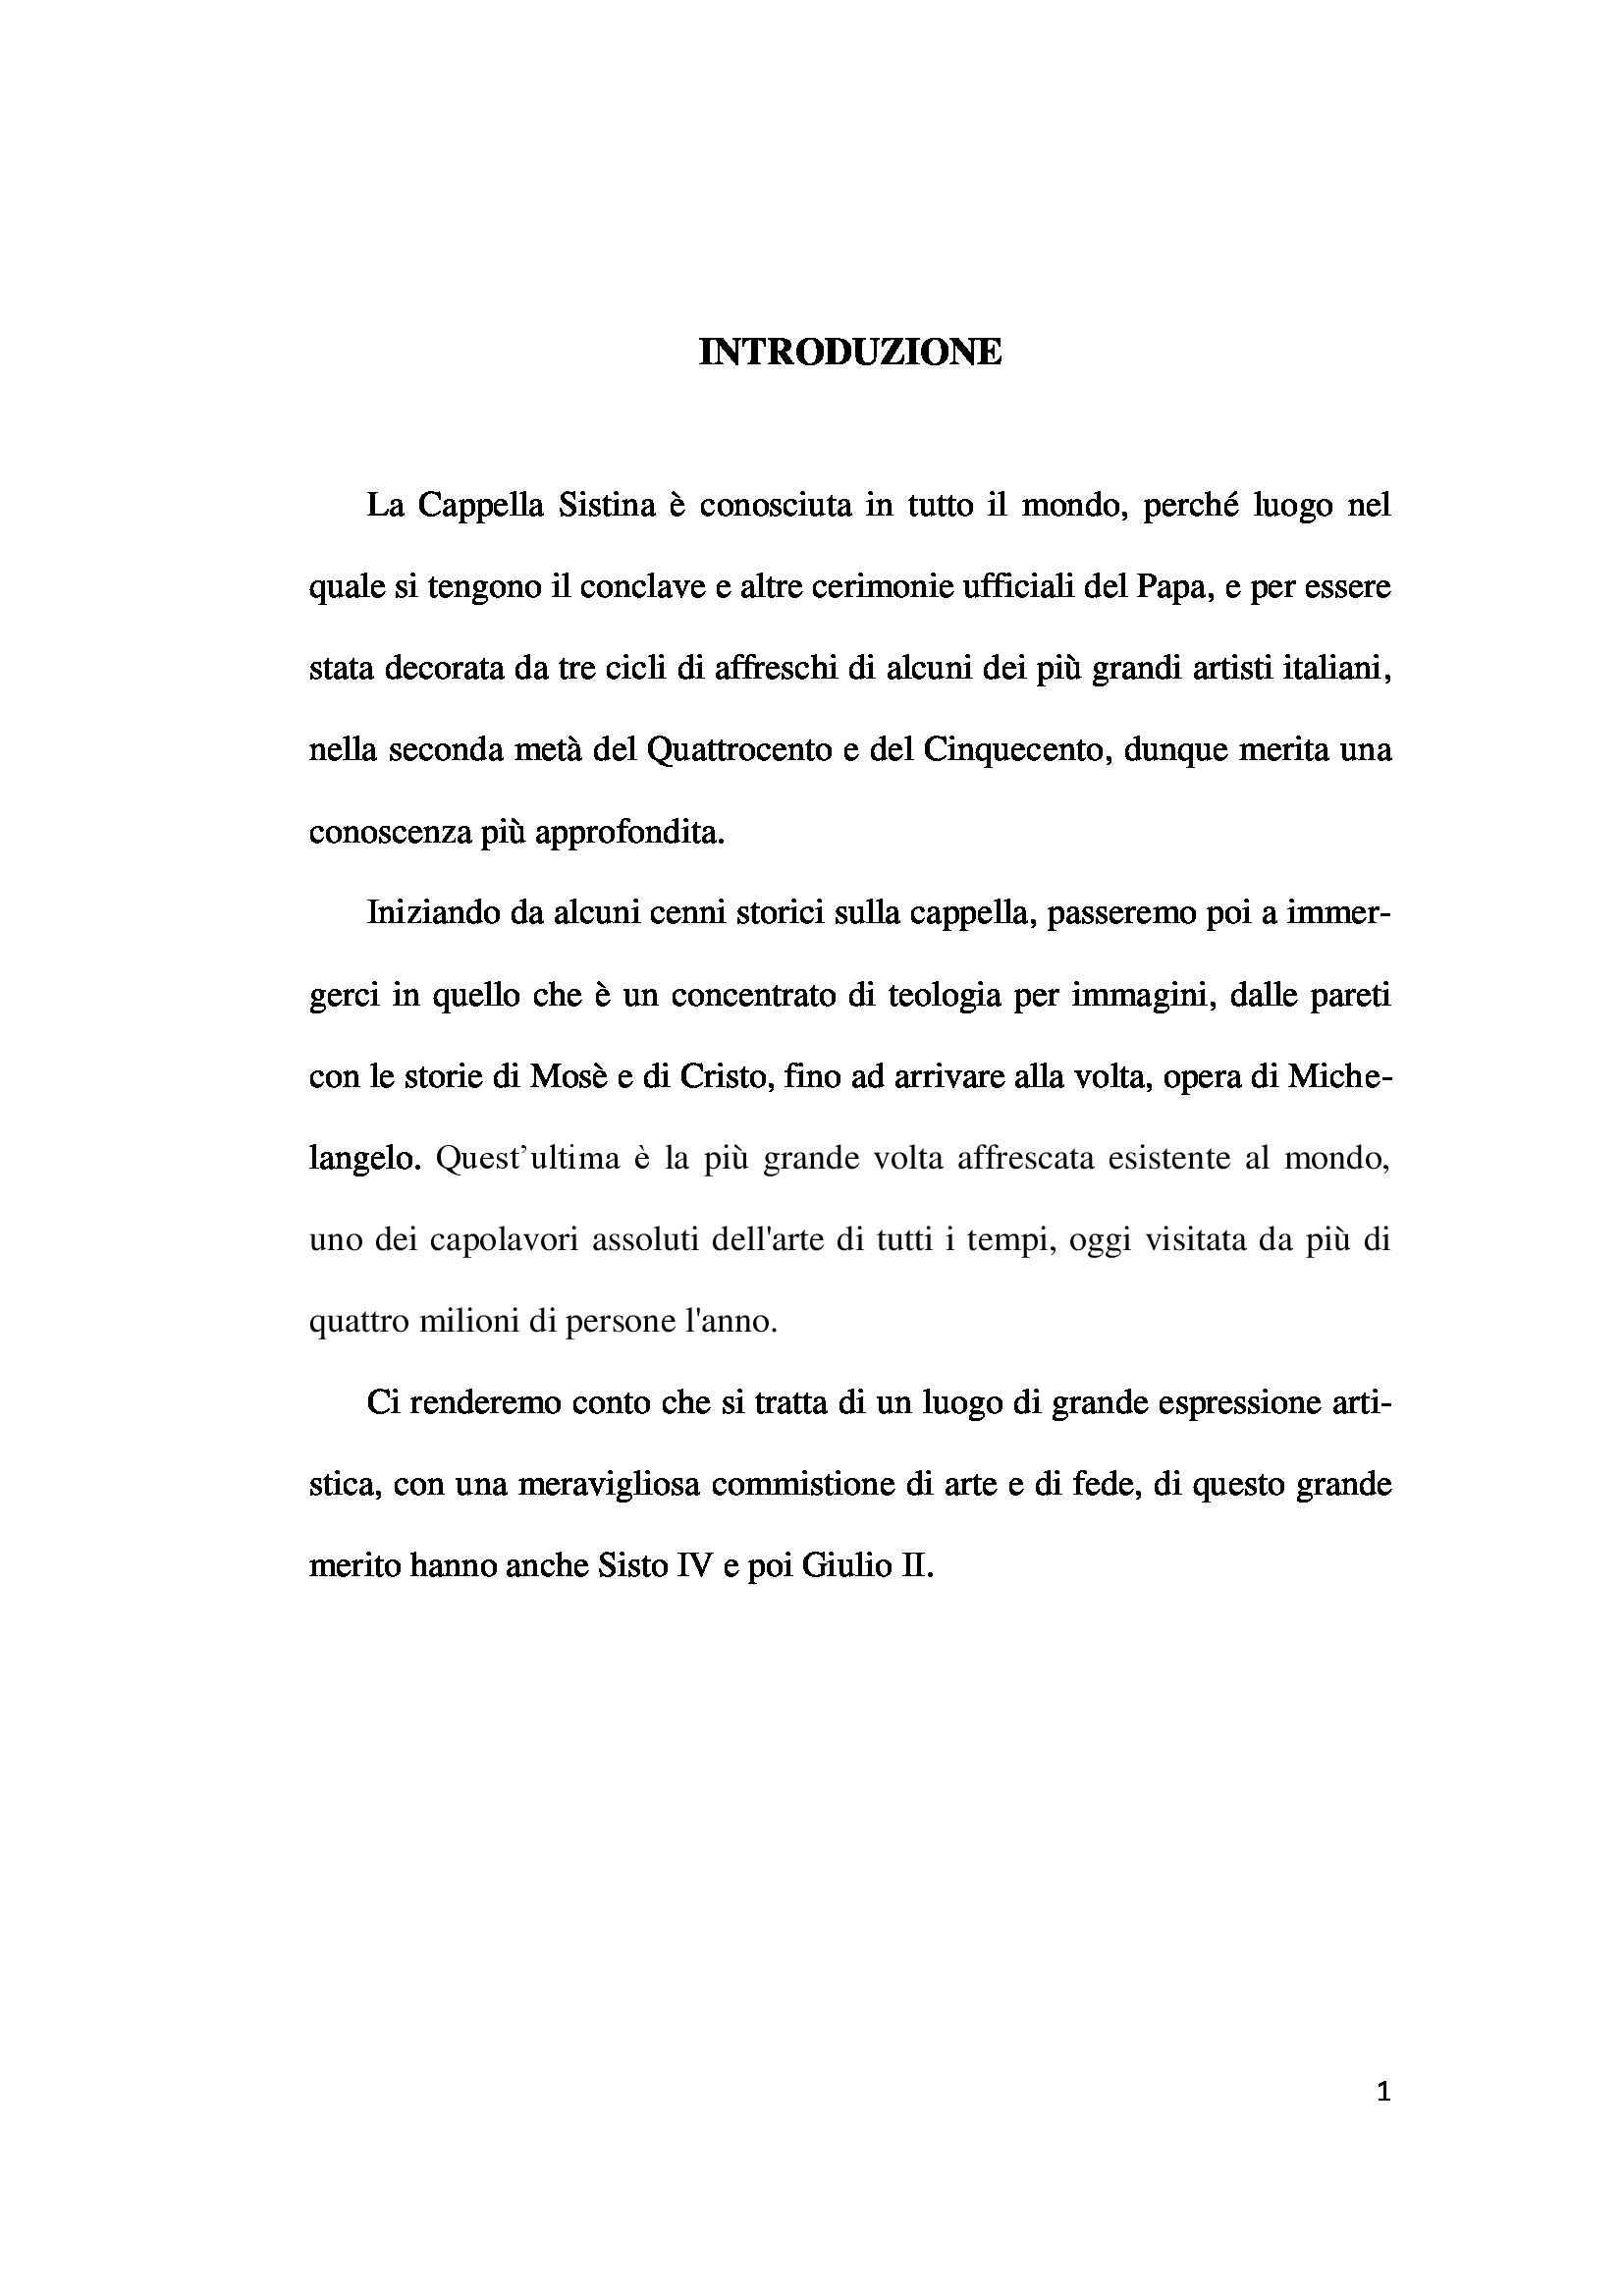 Tesi - Cappella Sistina Pag. 1